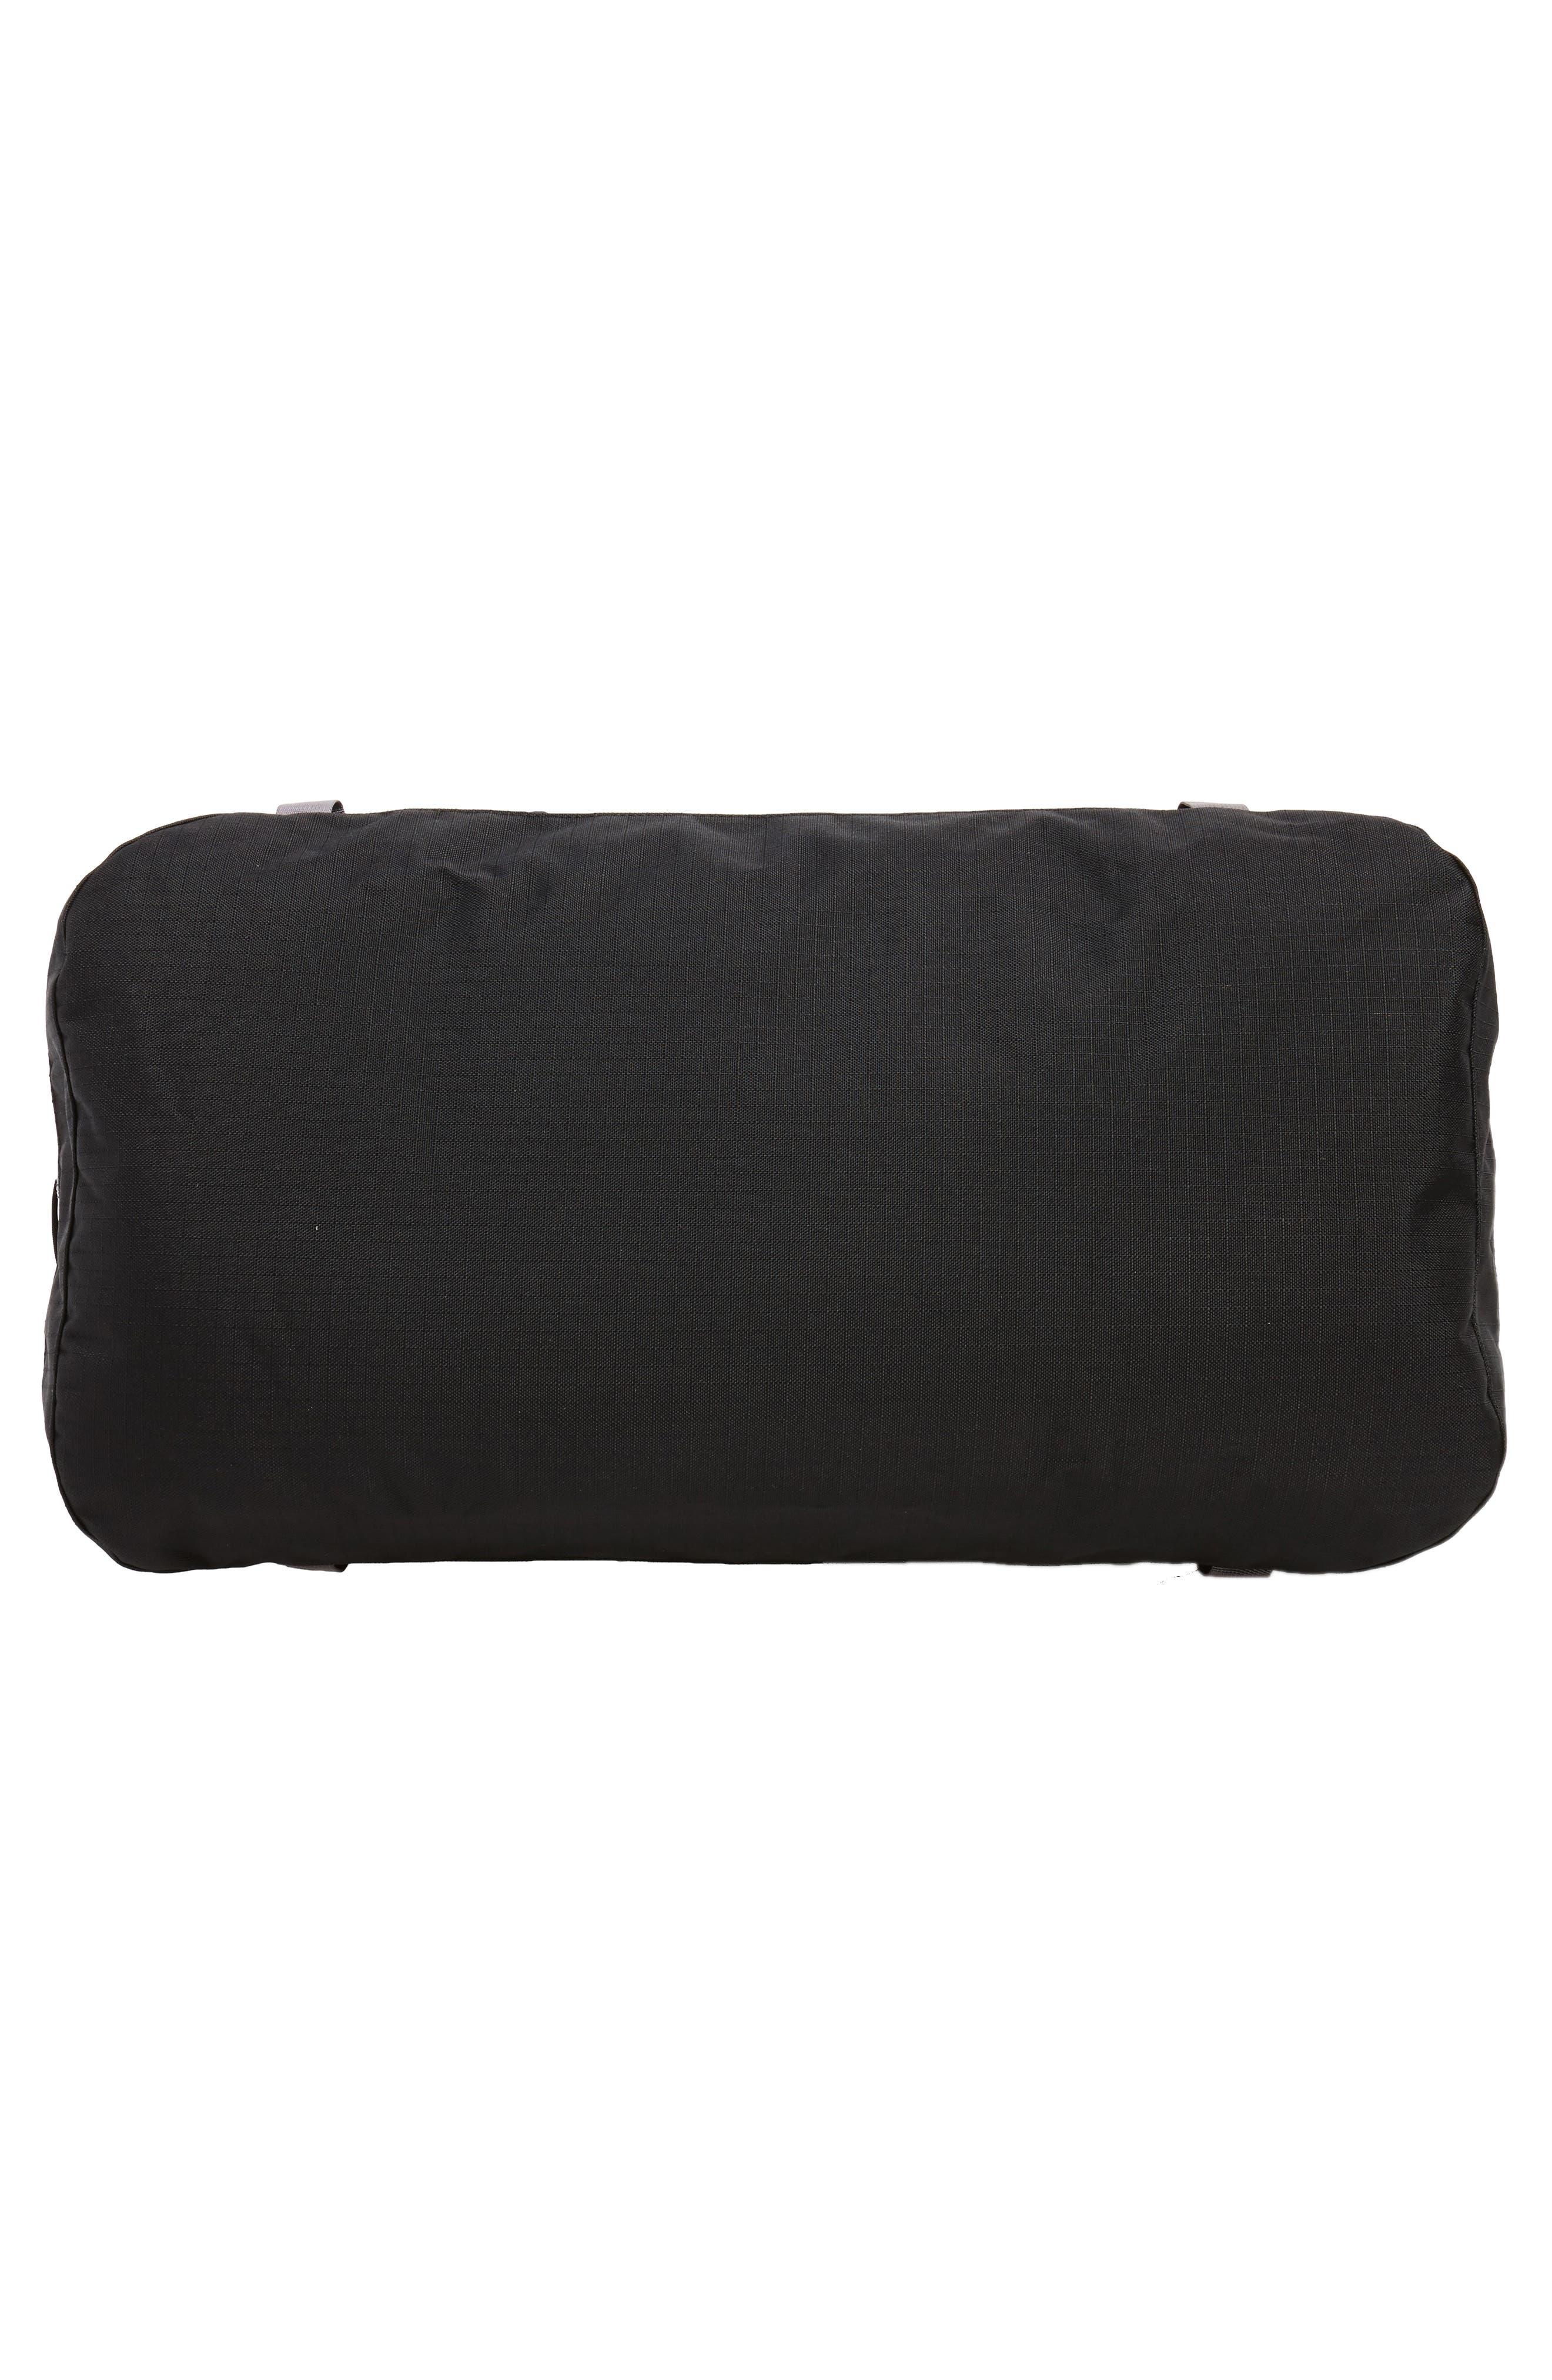 Black Hole Water Repellent Duffel Bag,                             Alternate thumbnail 6, color,                             Black